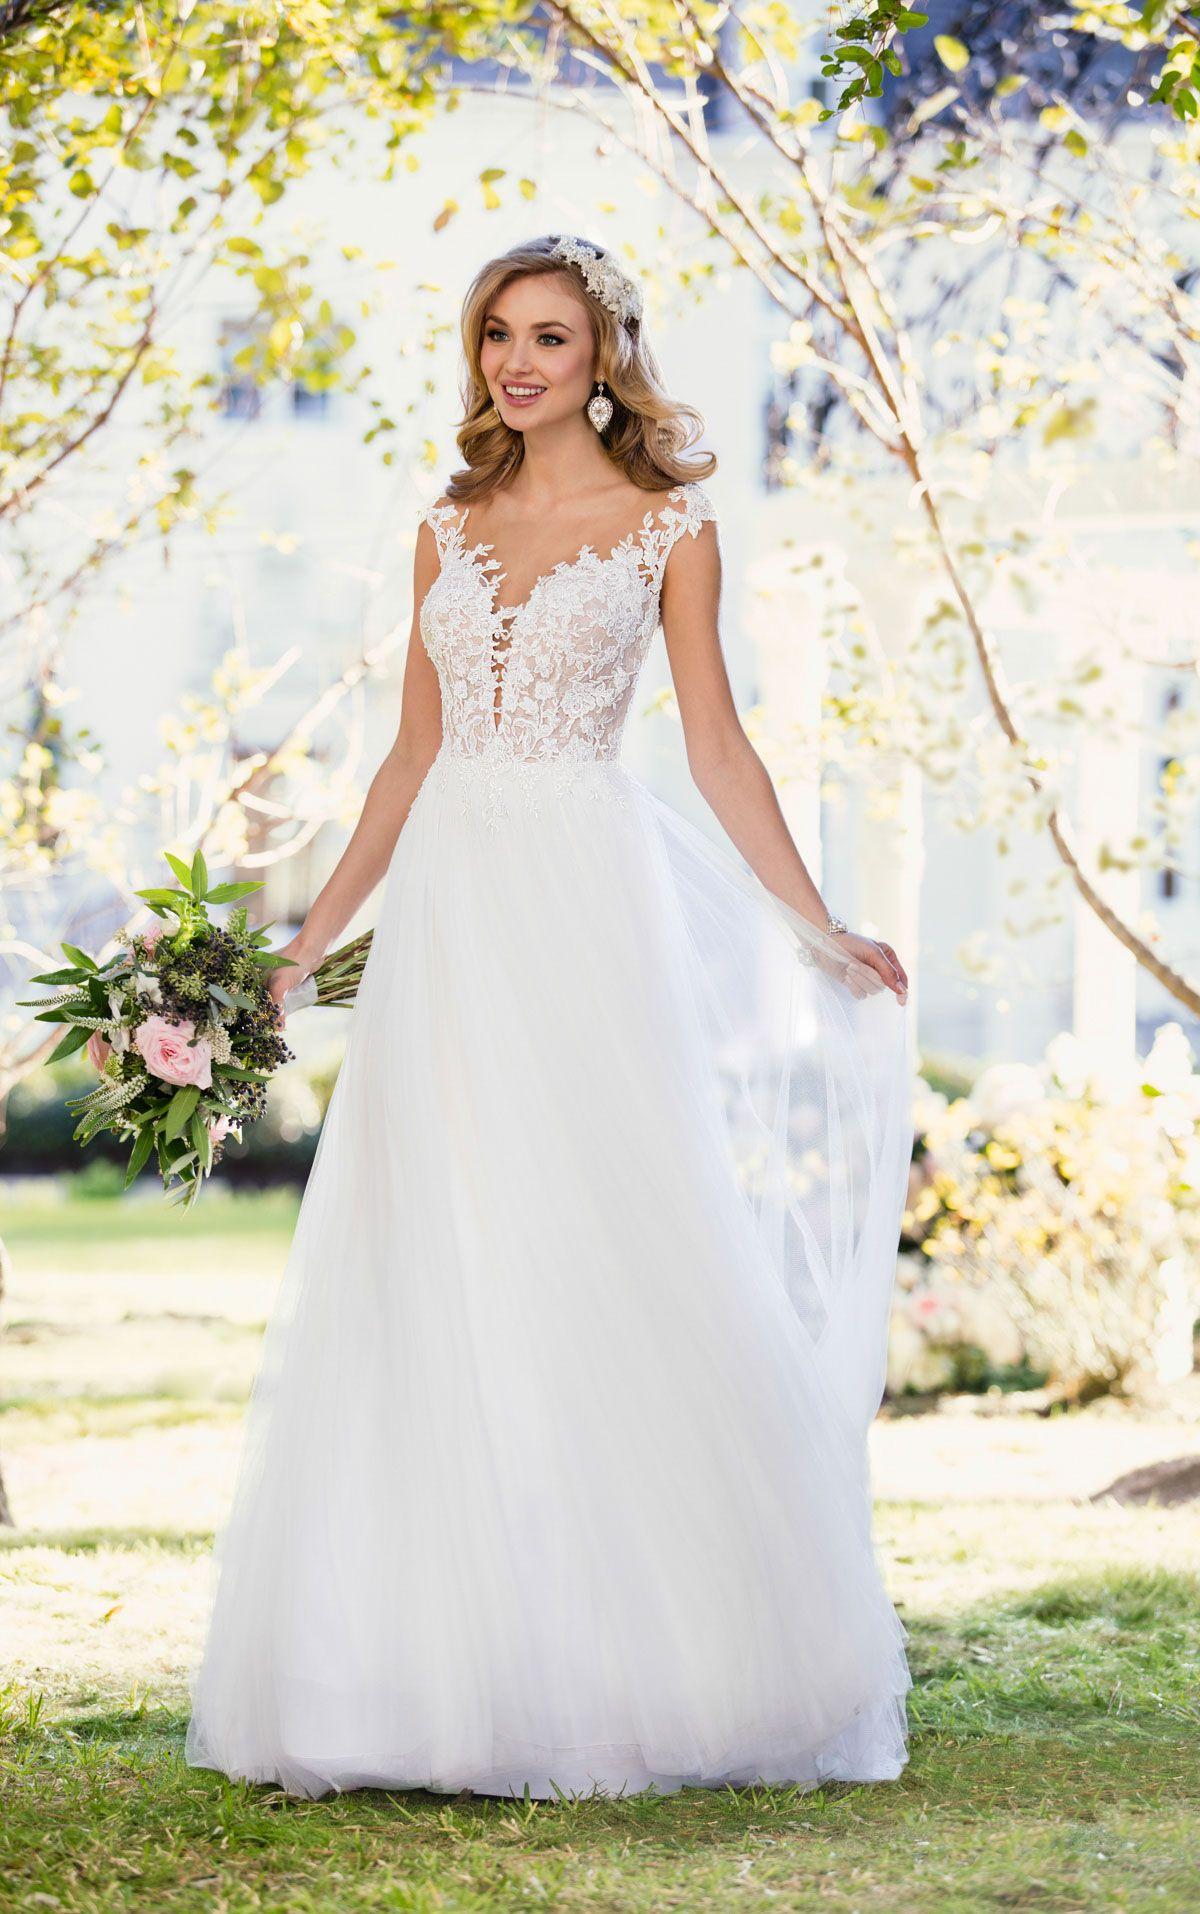 Beach Wedding Dresses Romantic Beach Wedding Gown Stella York Stella York Wedding Dress Casual Wedding Dress Beach Wedding Gown